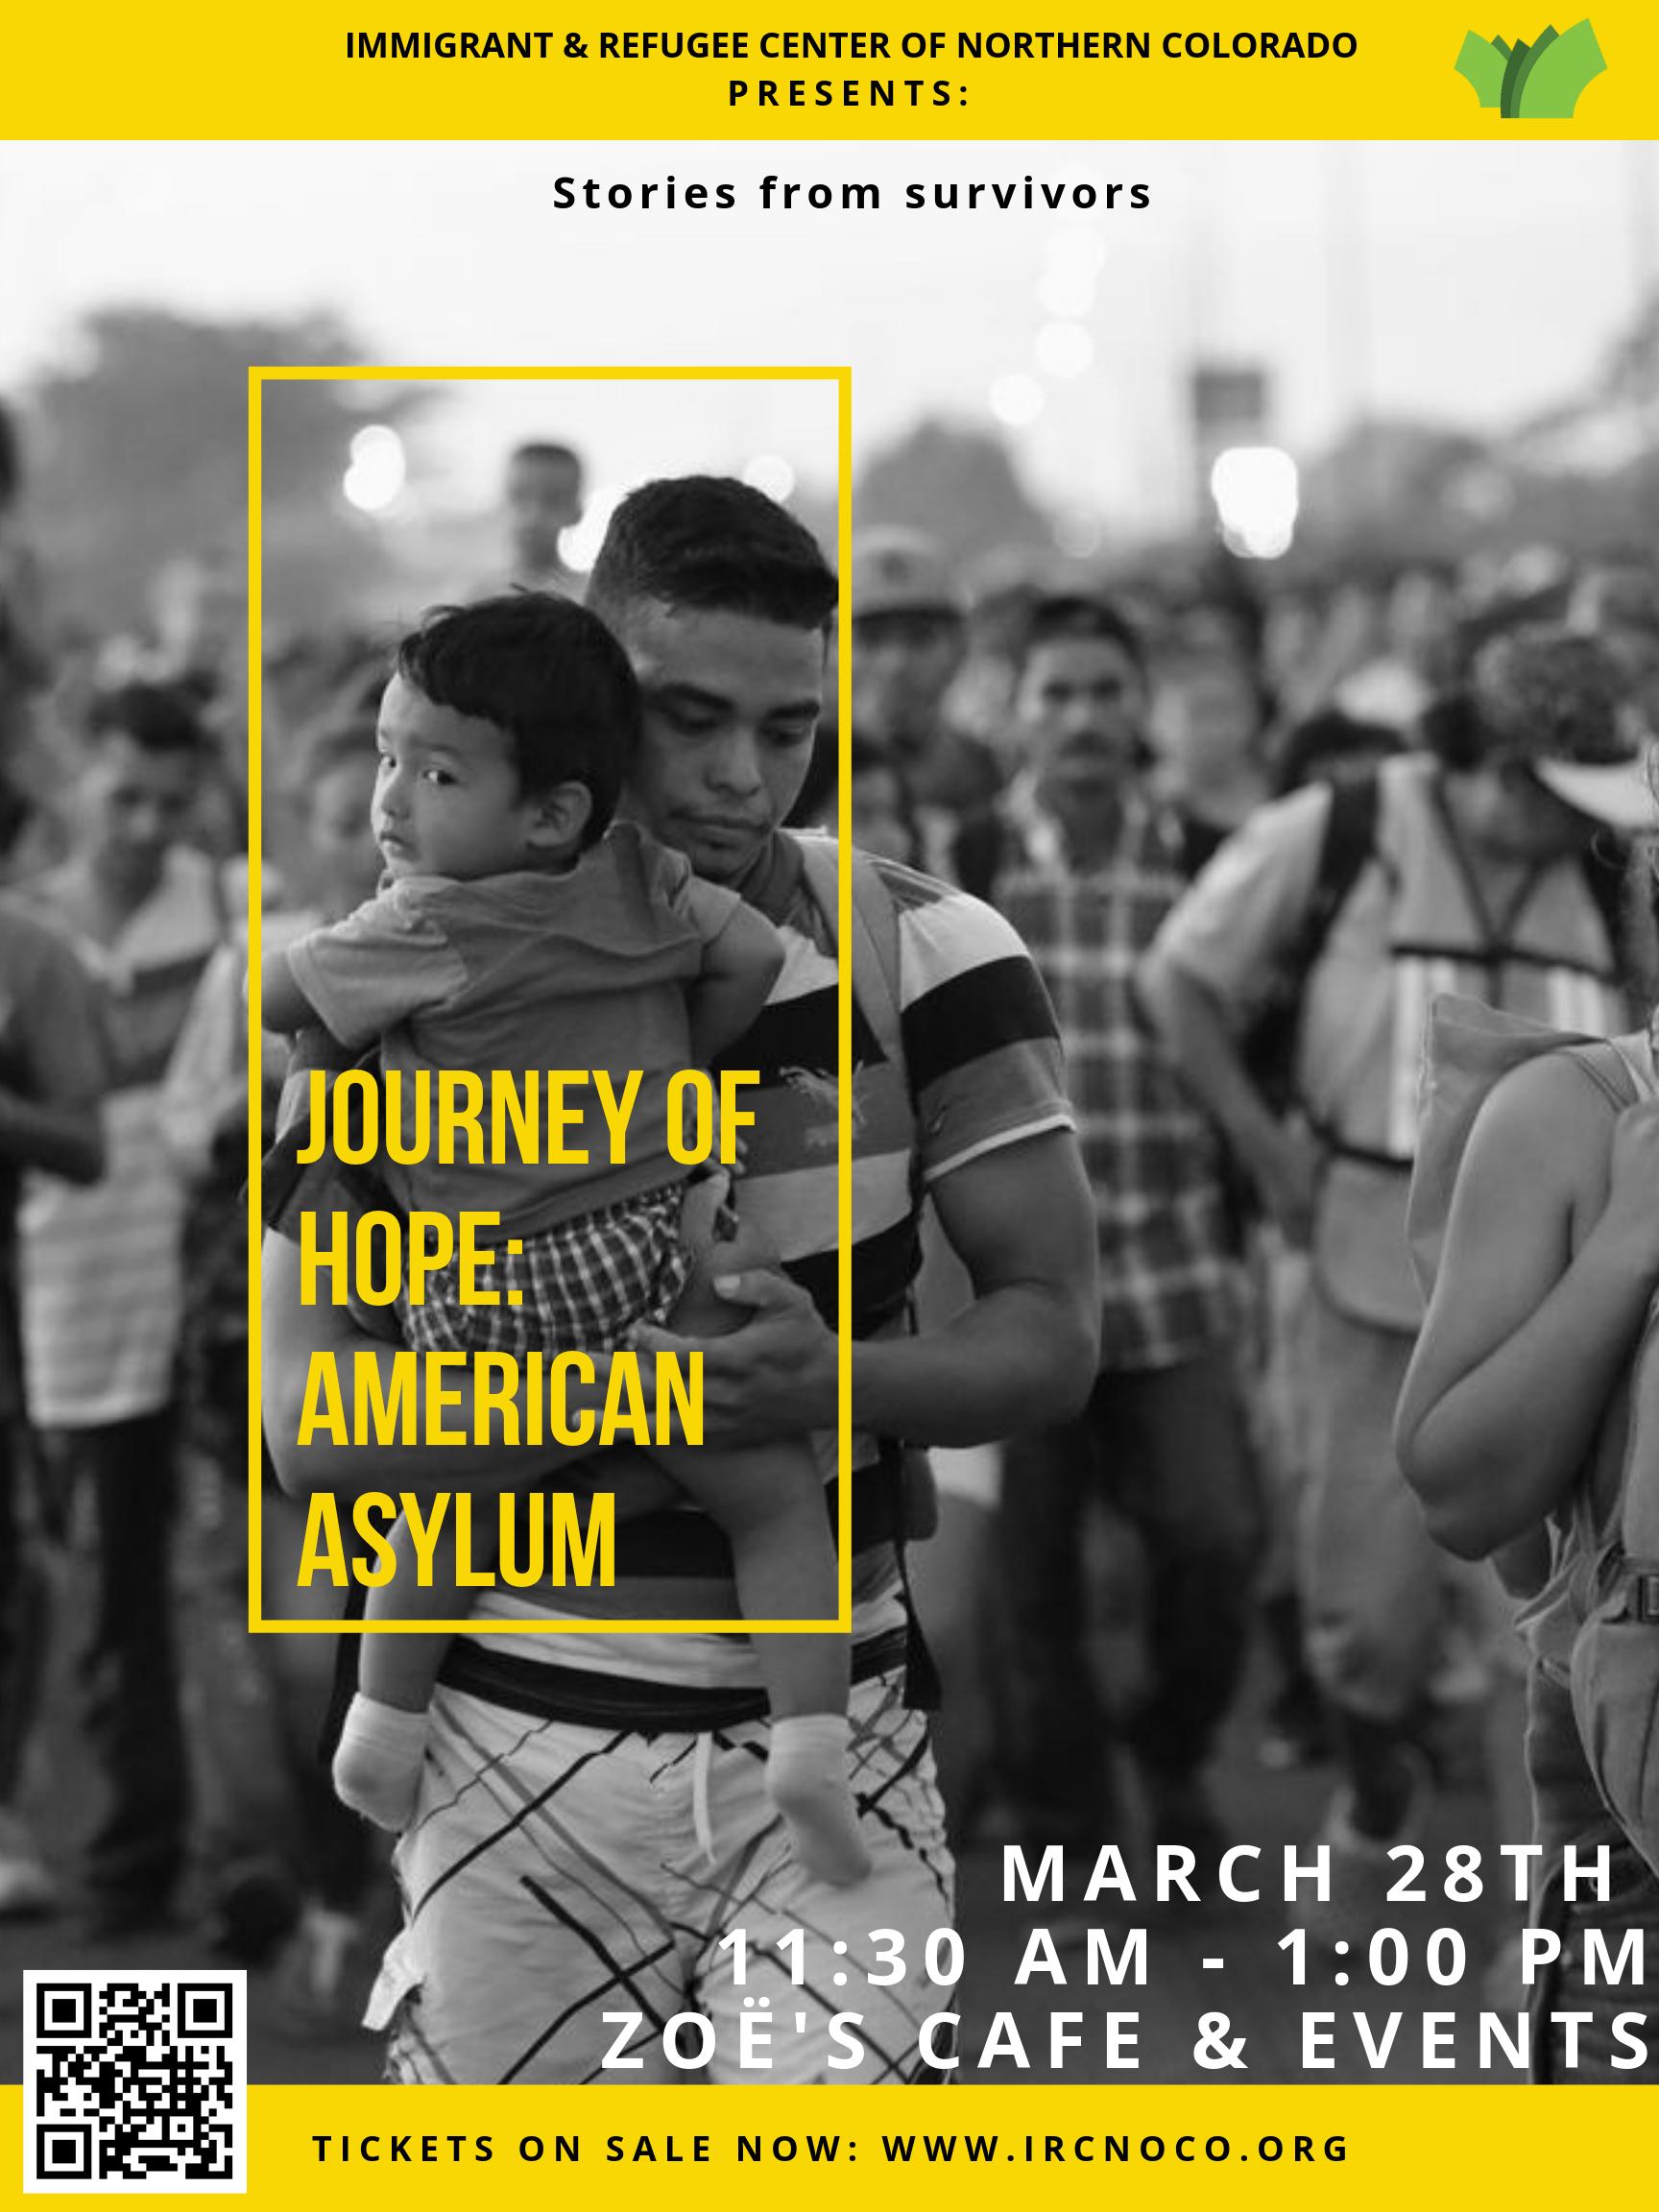 American Asylum